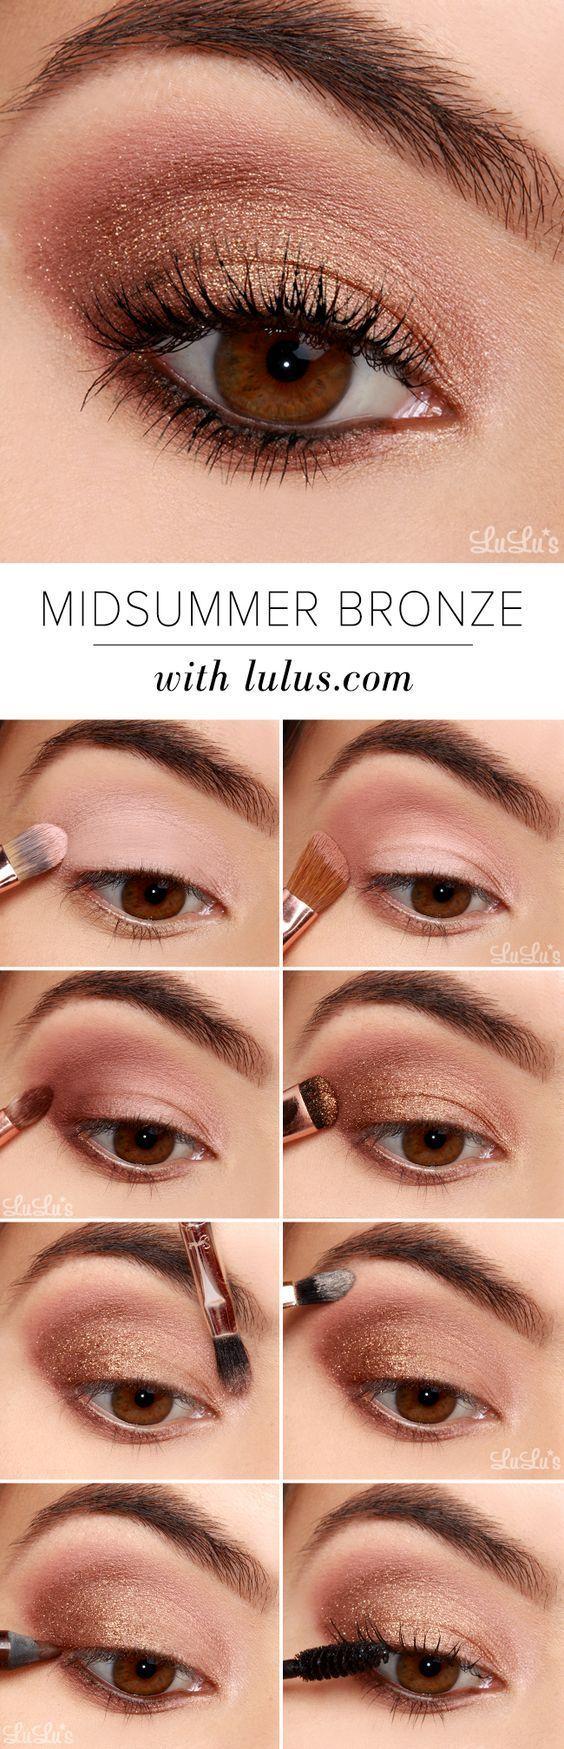 Photo of Lulus How-To: Midsummer Bronze Eyeshadow Tutorial – Lulus.com Fashion Blog